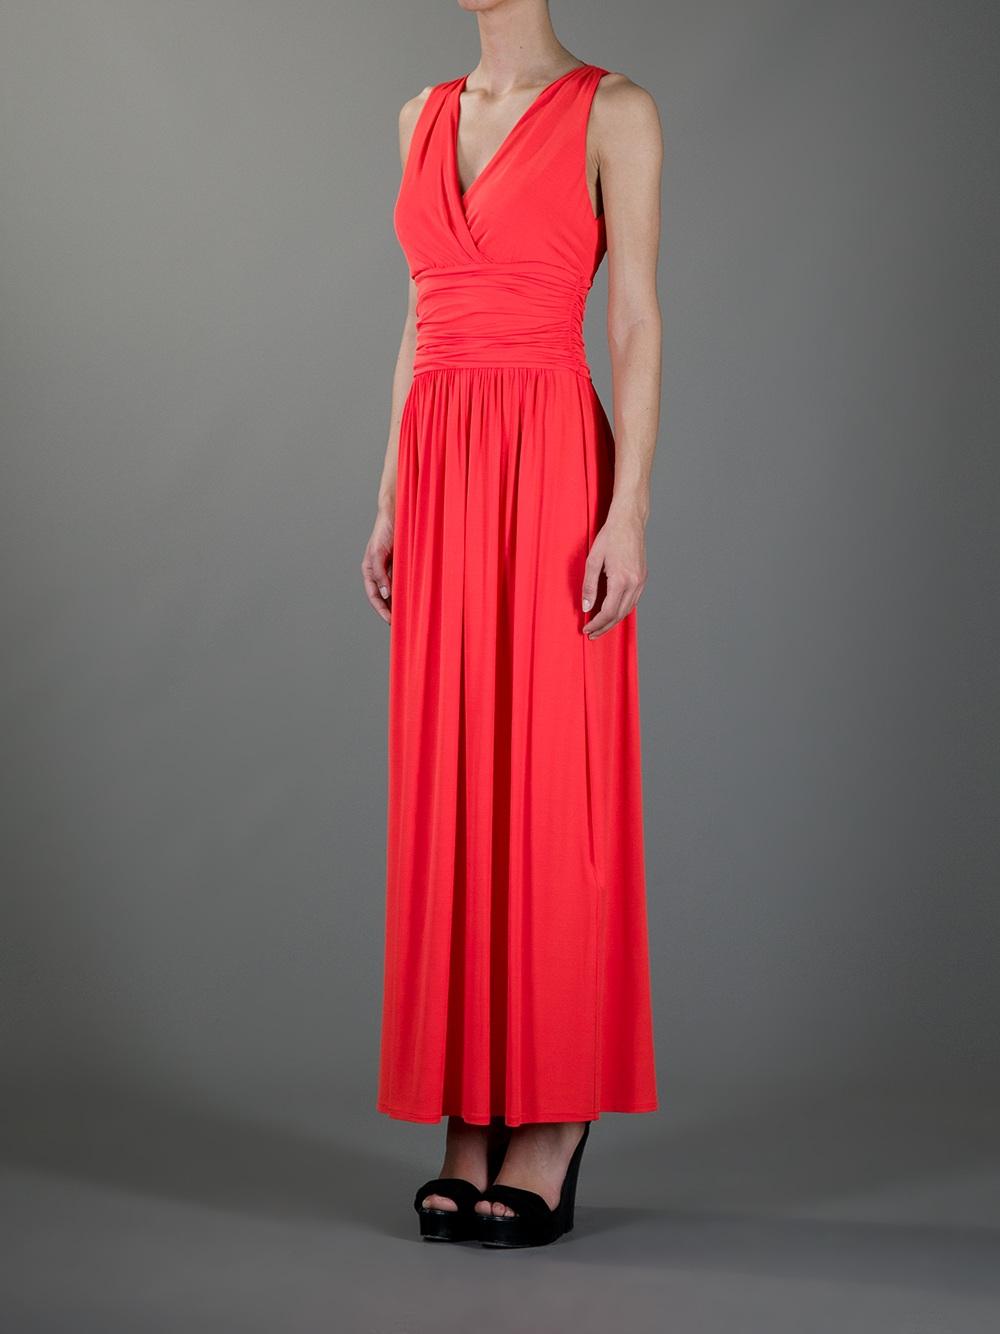 Lyst Max Mara Studio Wrap Around Maxi Dress In Red